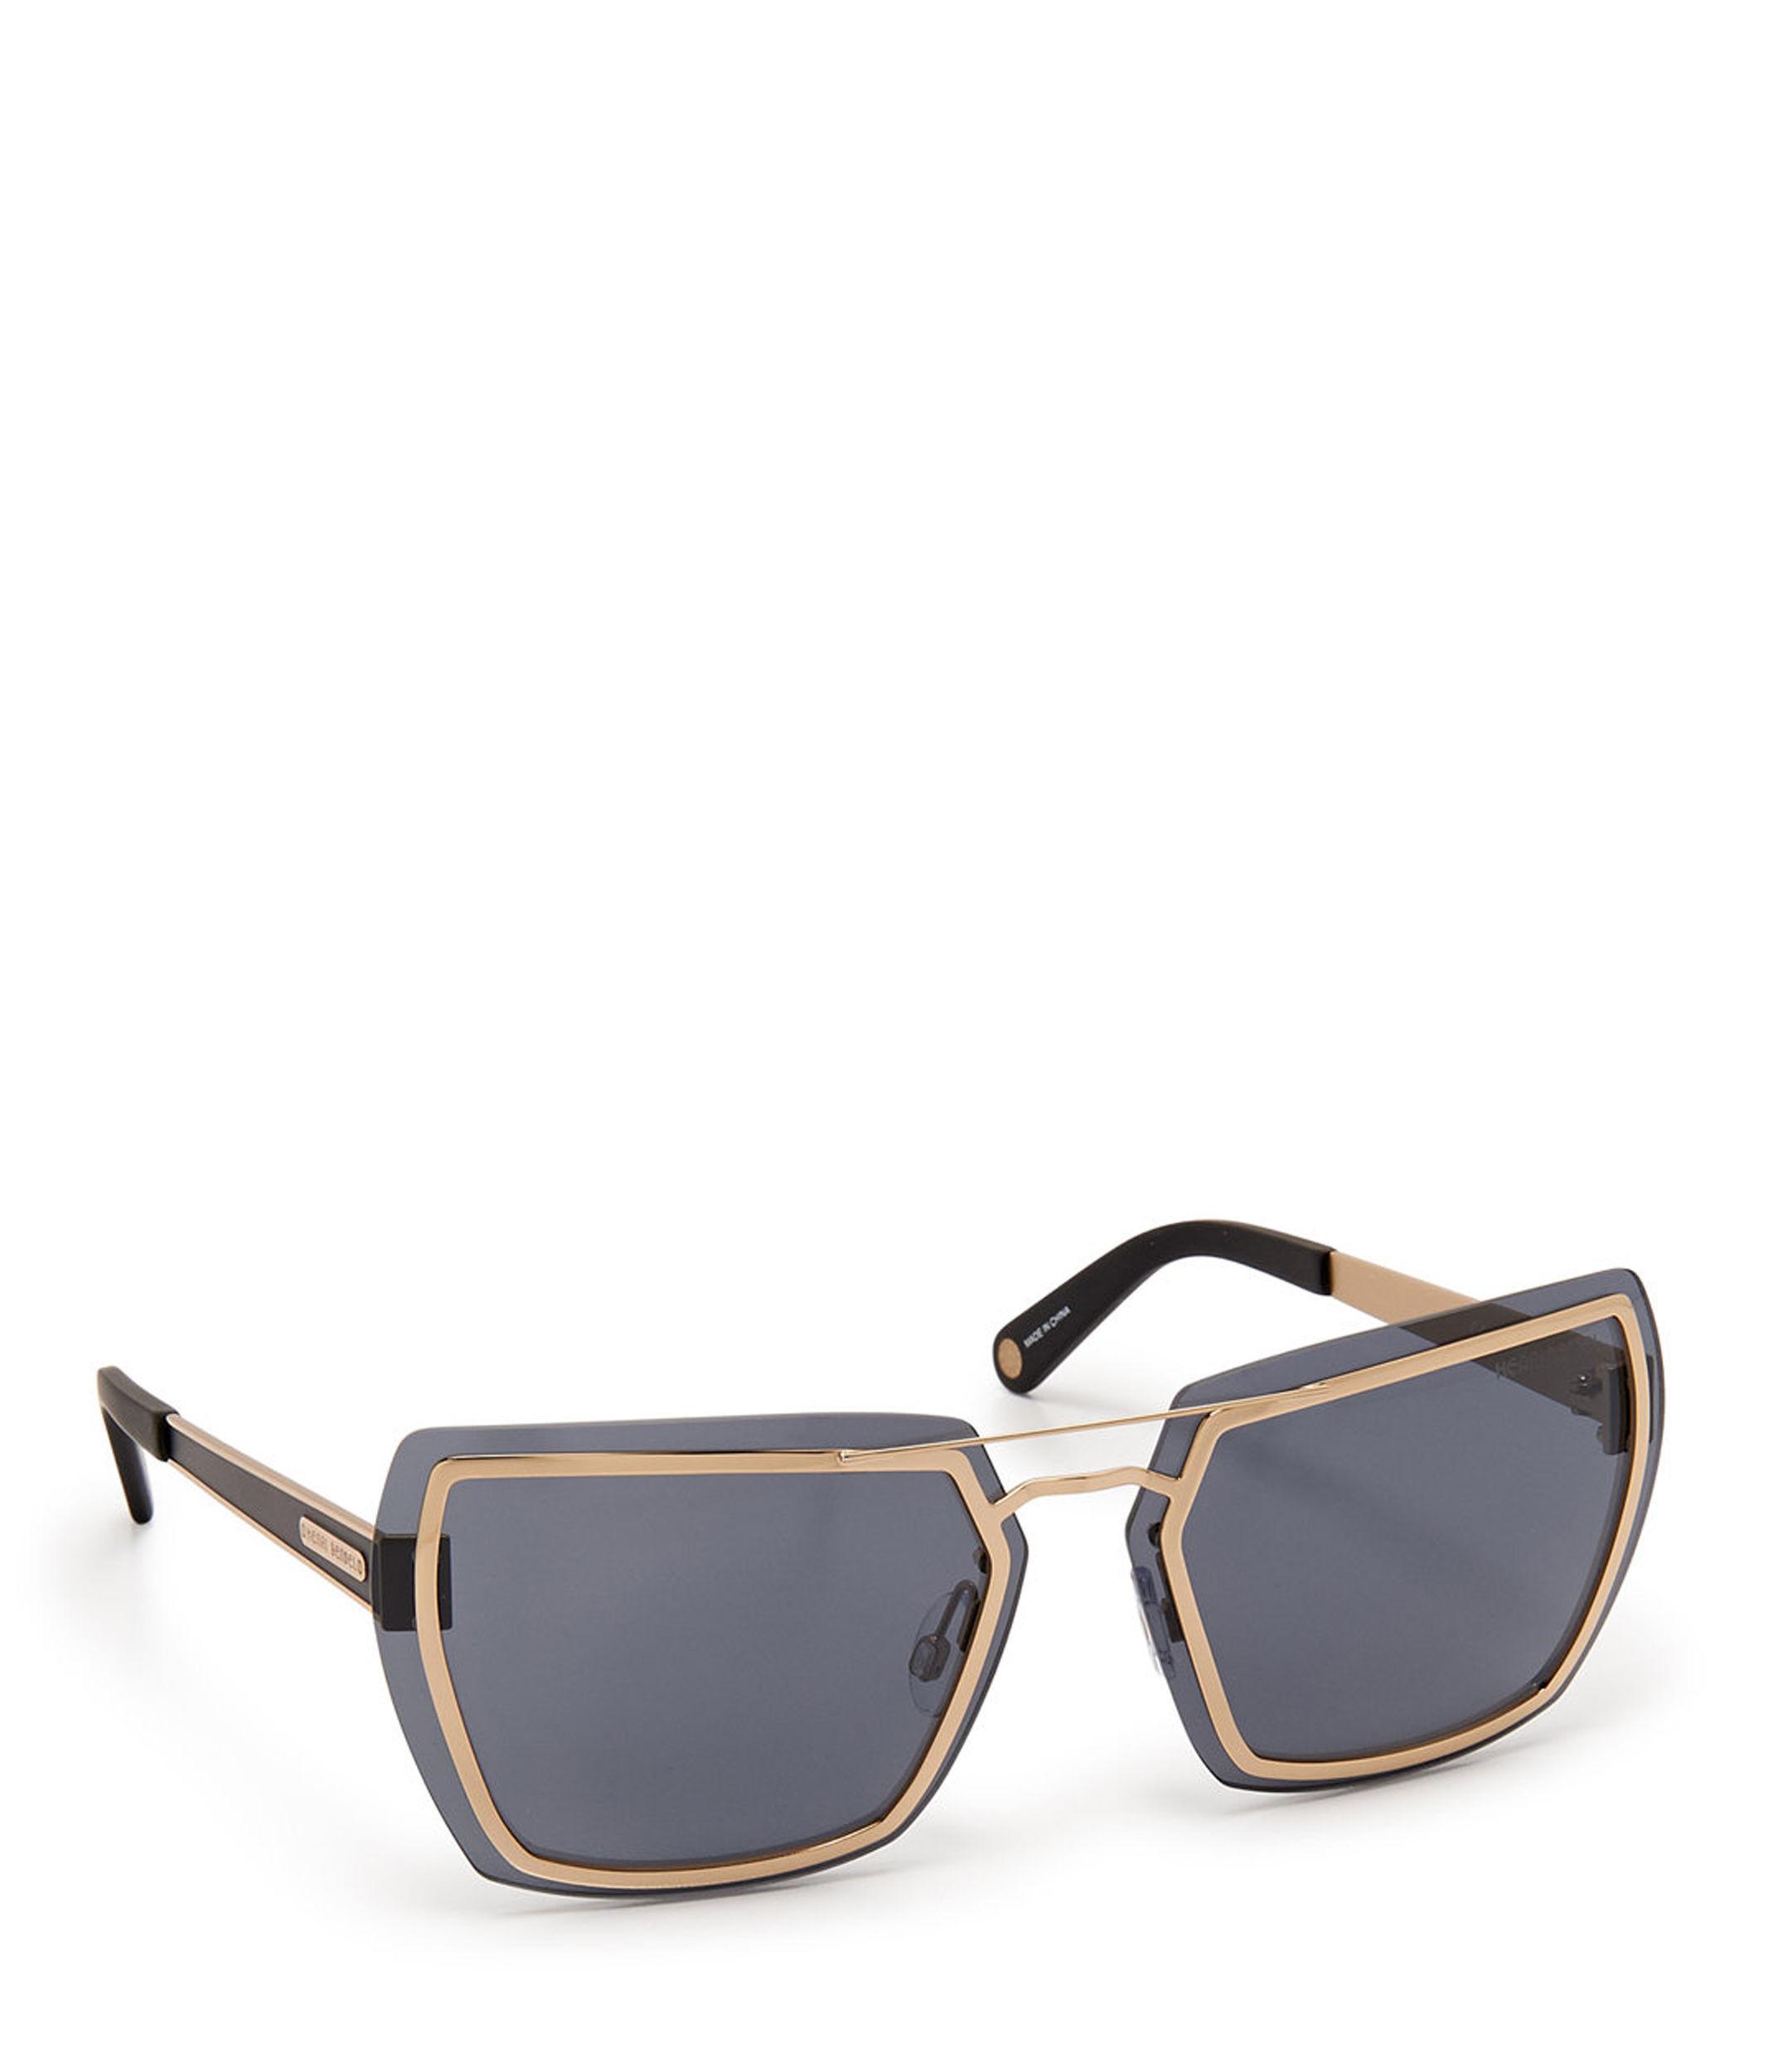 10b2425e5e Henri Bendel. Women s Quincy Square Sunglasses